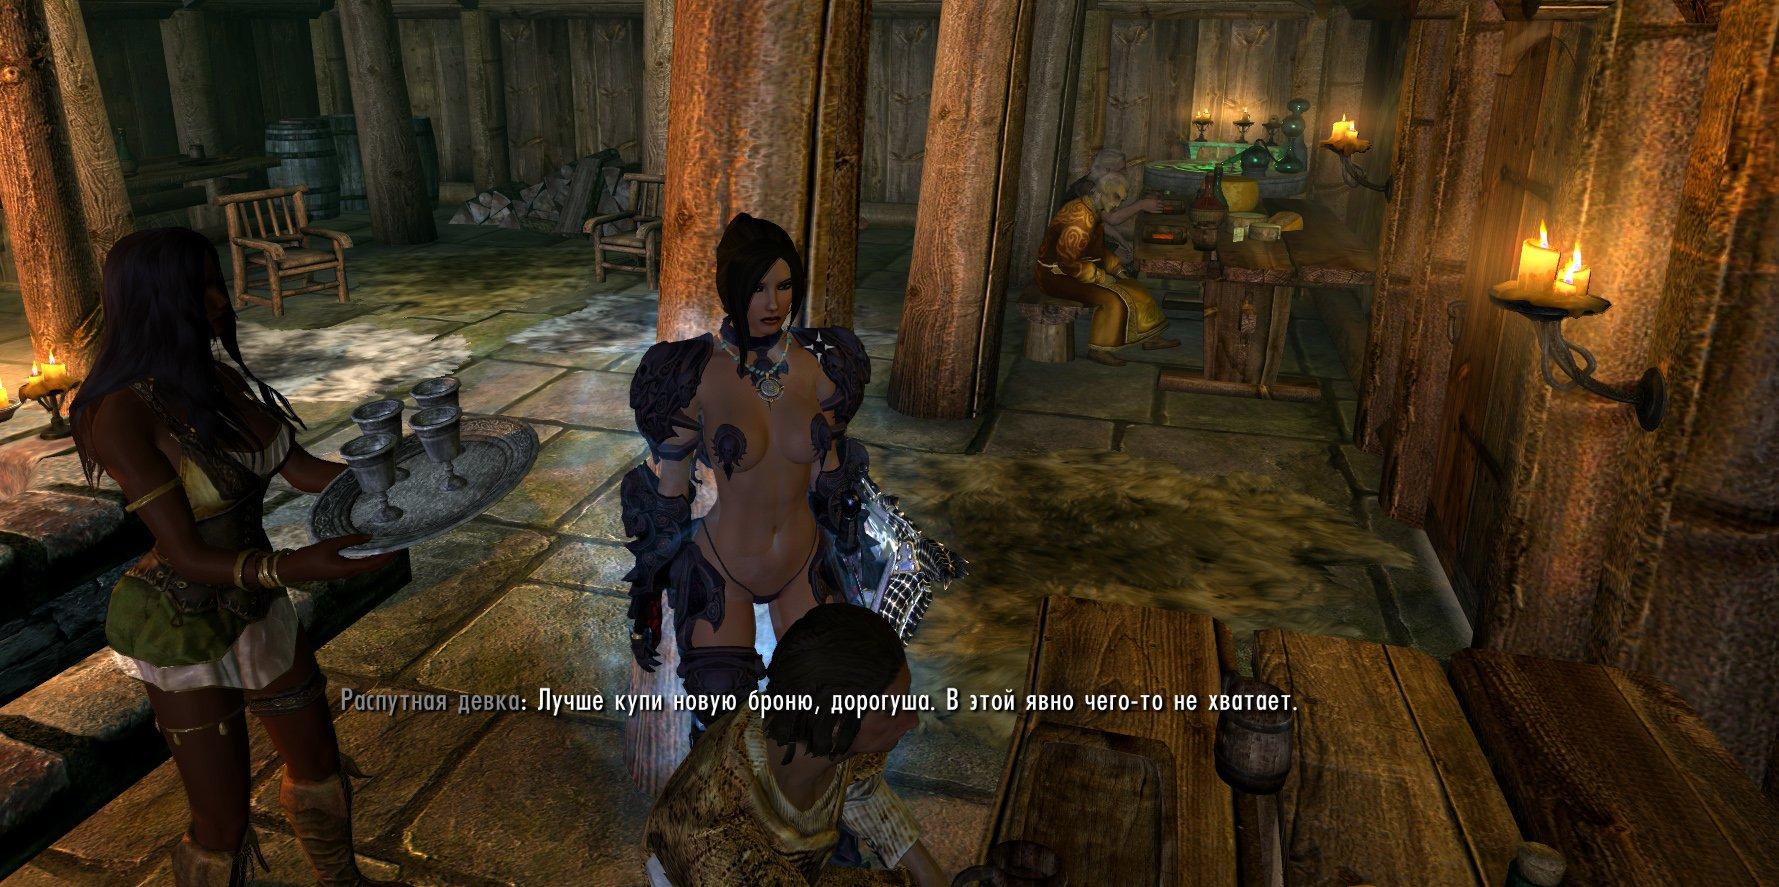 Sexist/Derogatory Guards, NPCs and Player Comments